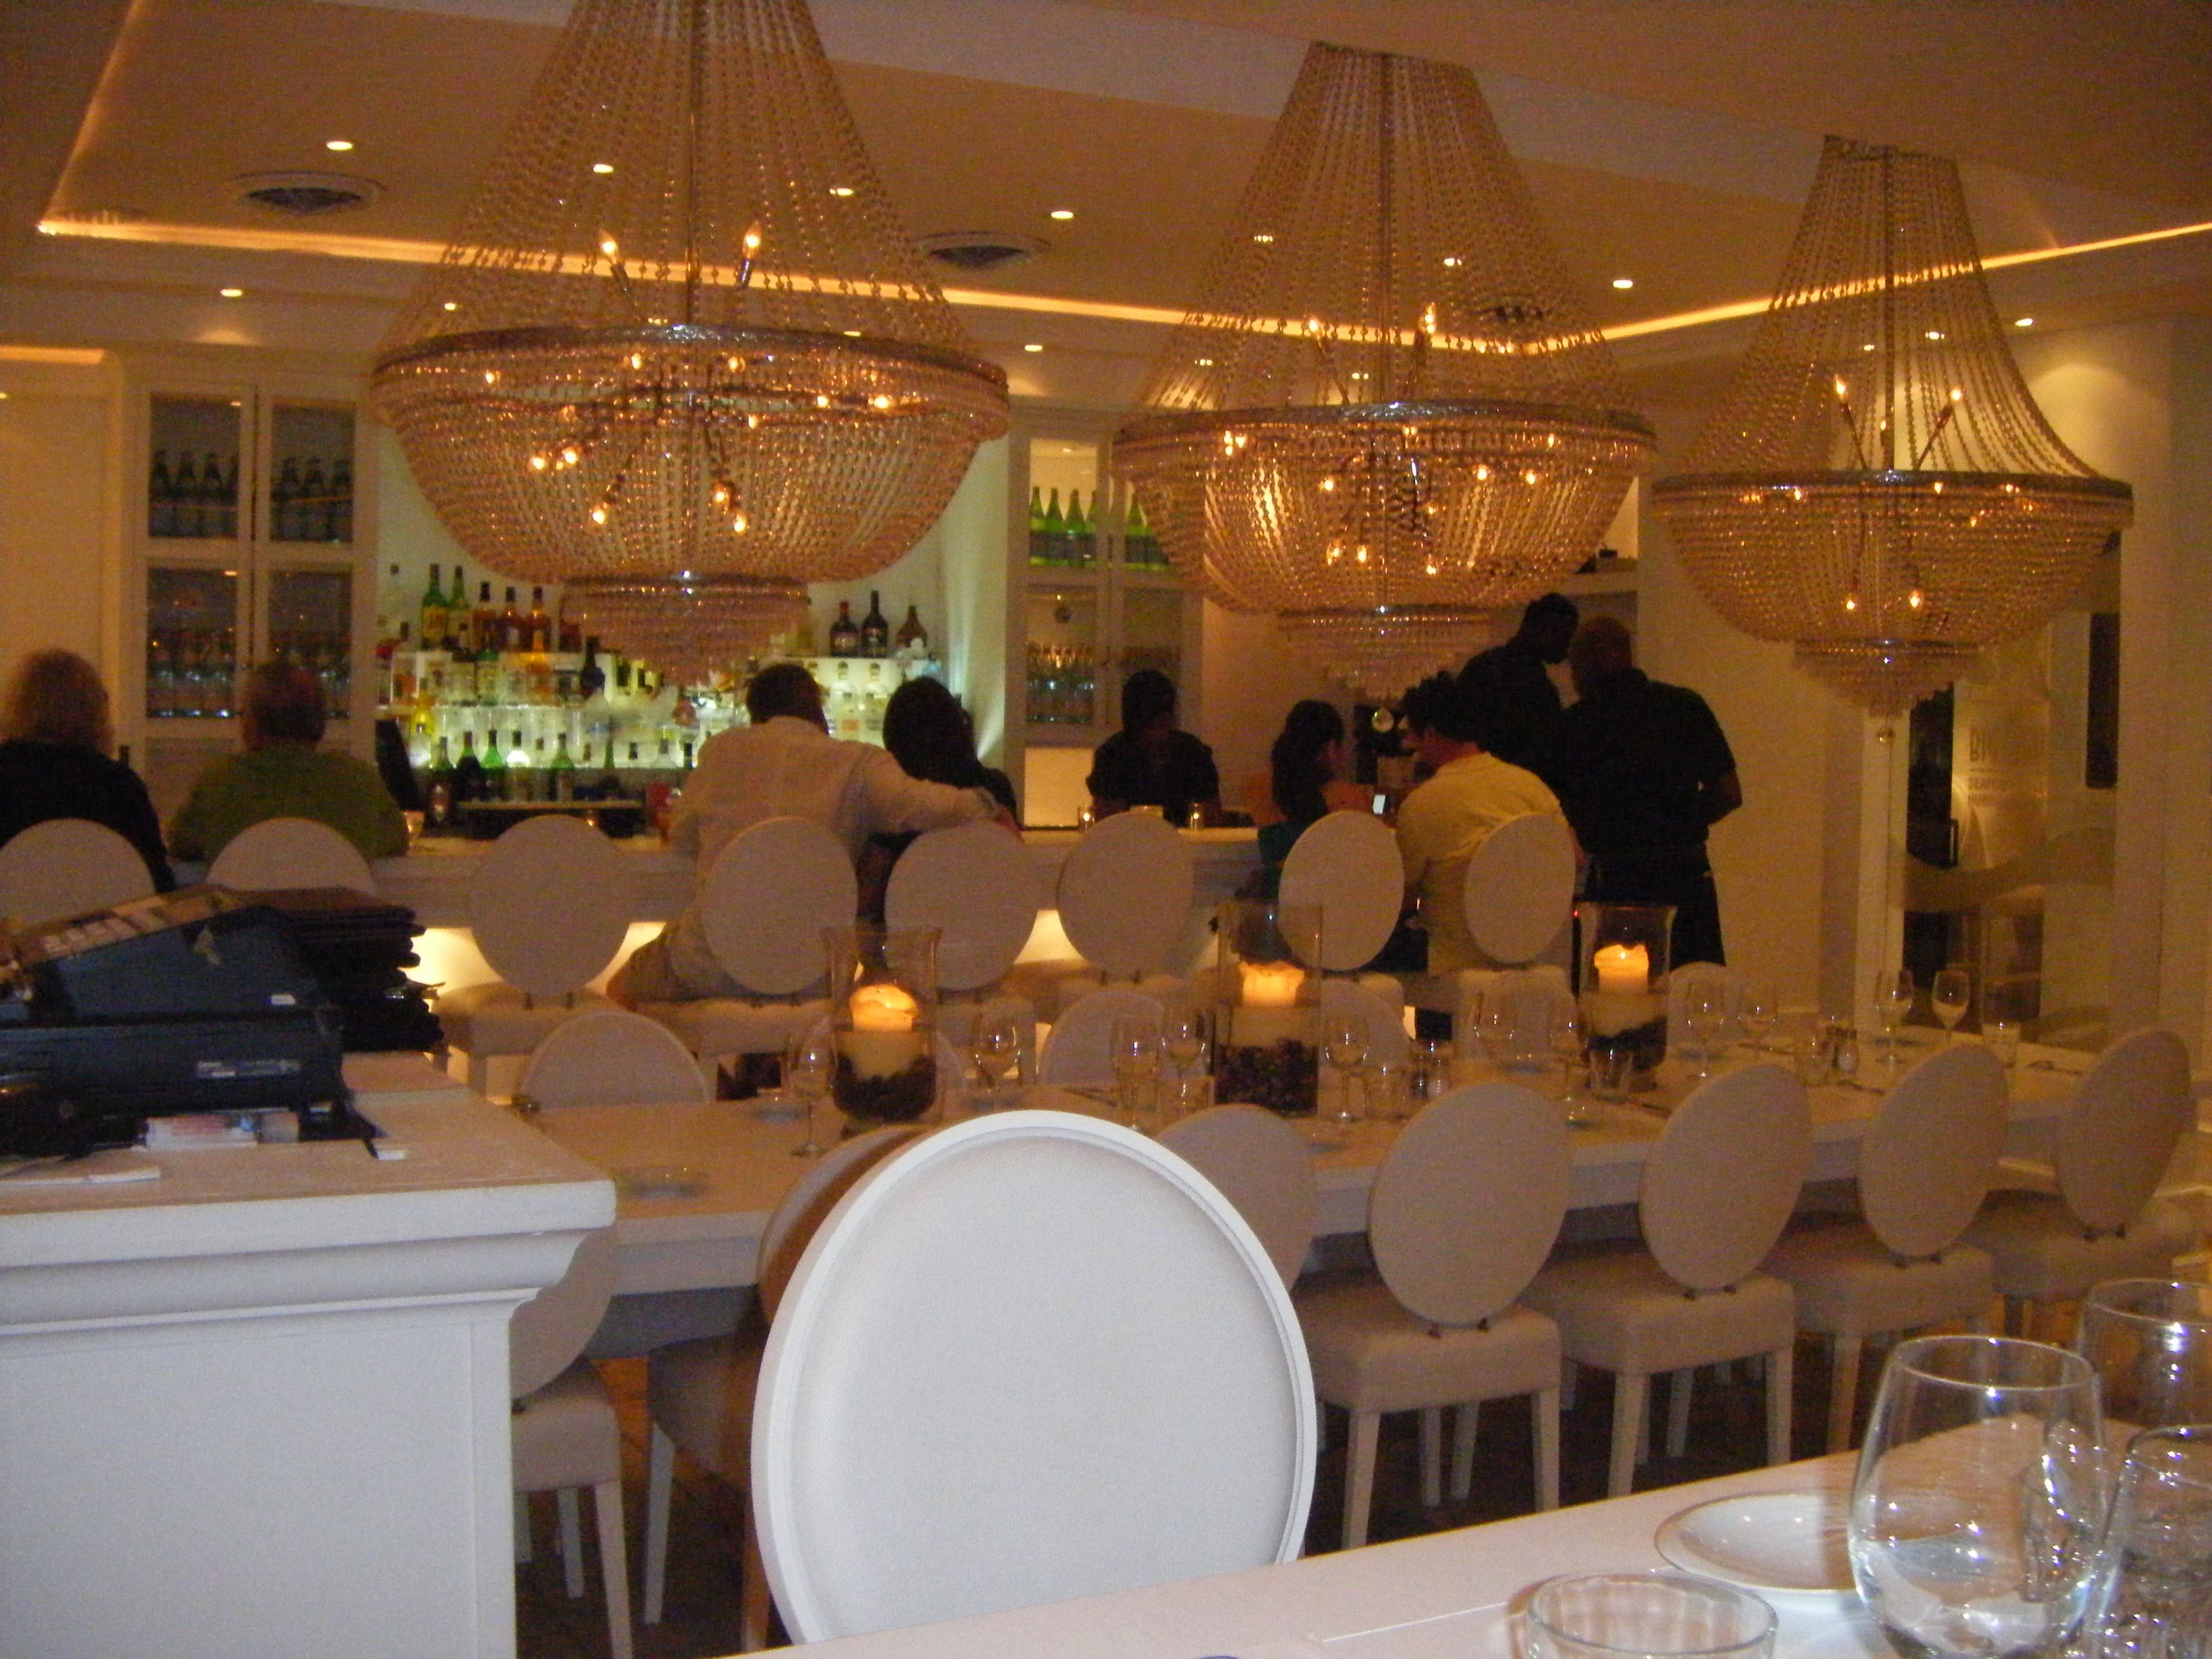 big fish restaurant dawn beach st. martinlove, love the decor